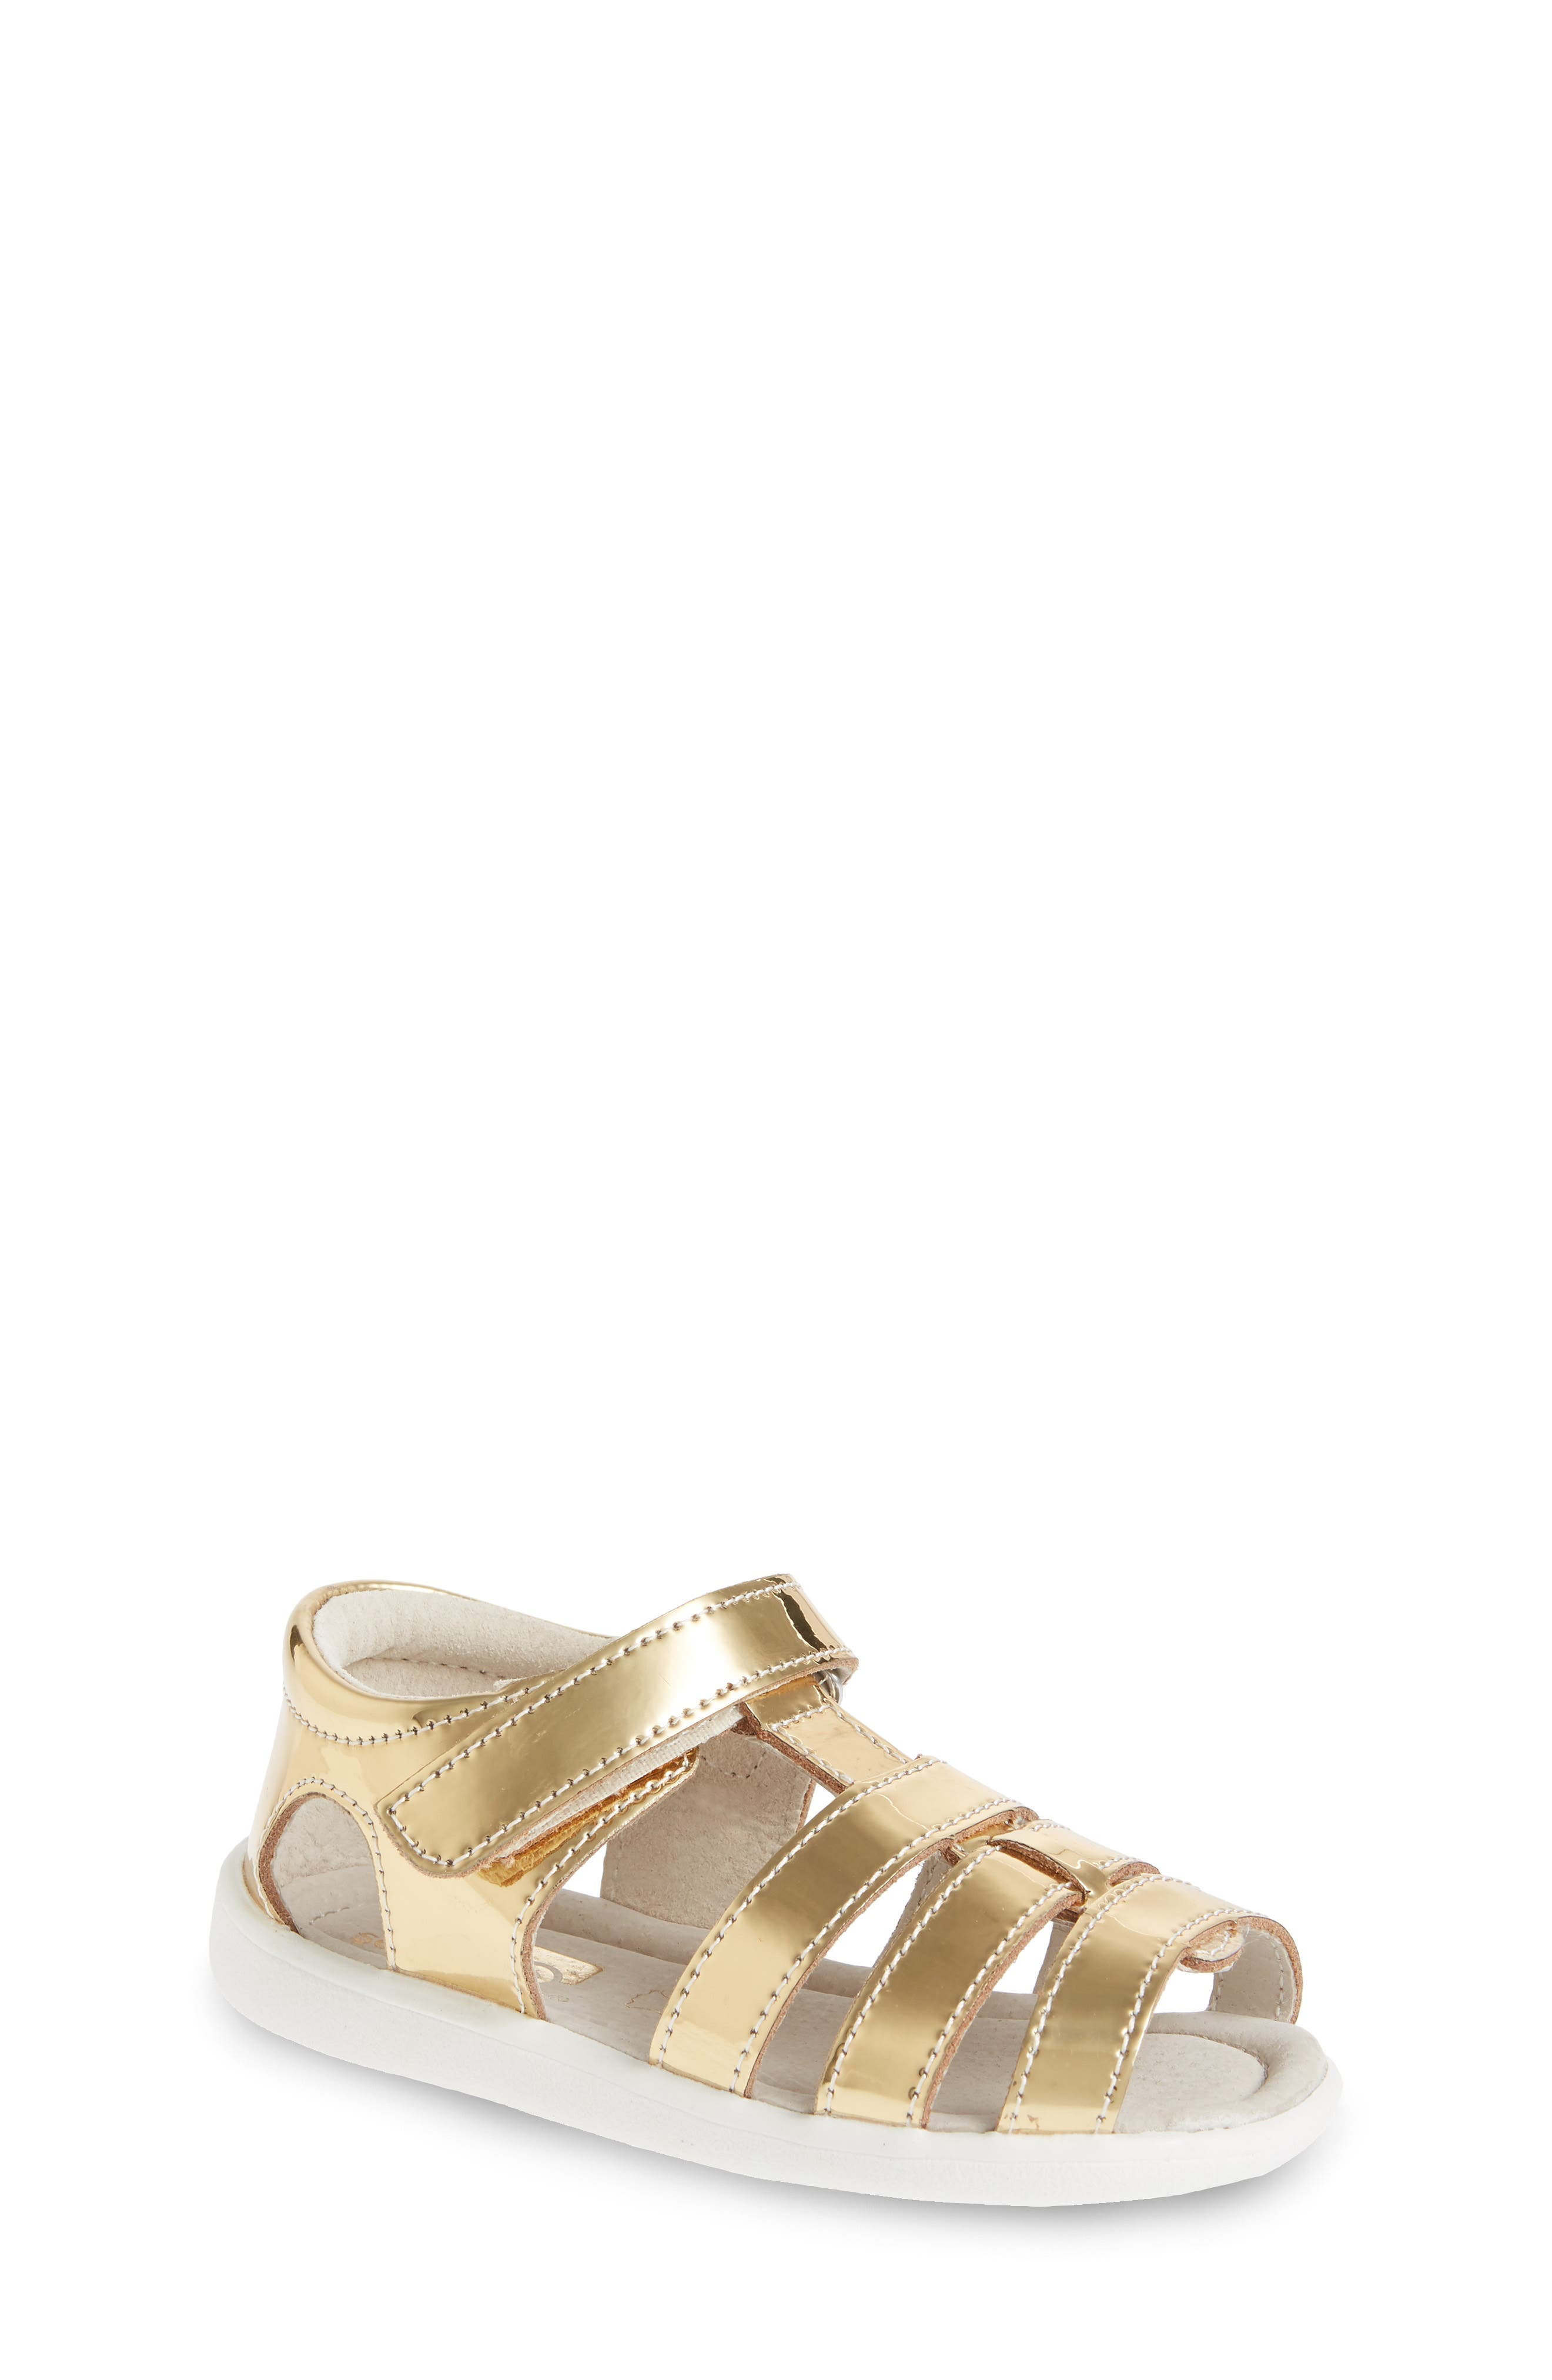 'Fe' Metallic Leather Gladiator Sandal,                         Main,                         color, 710